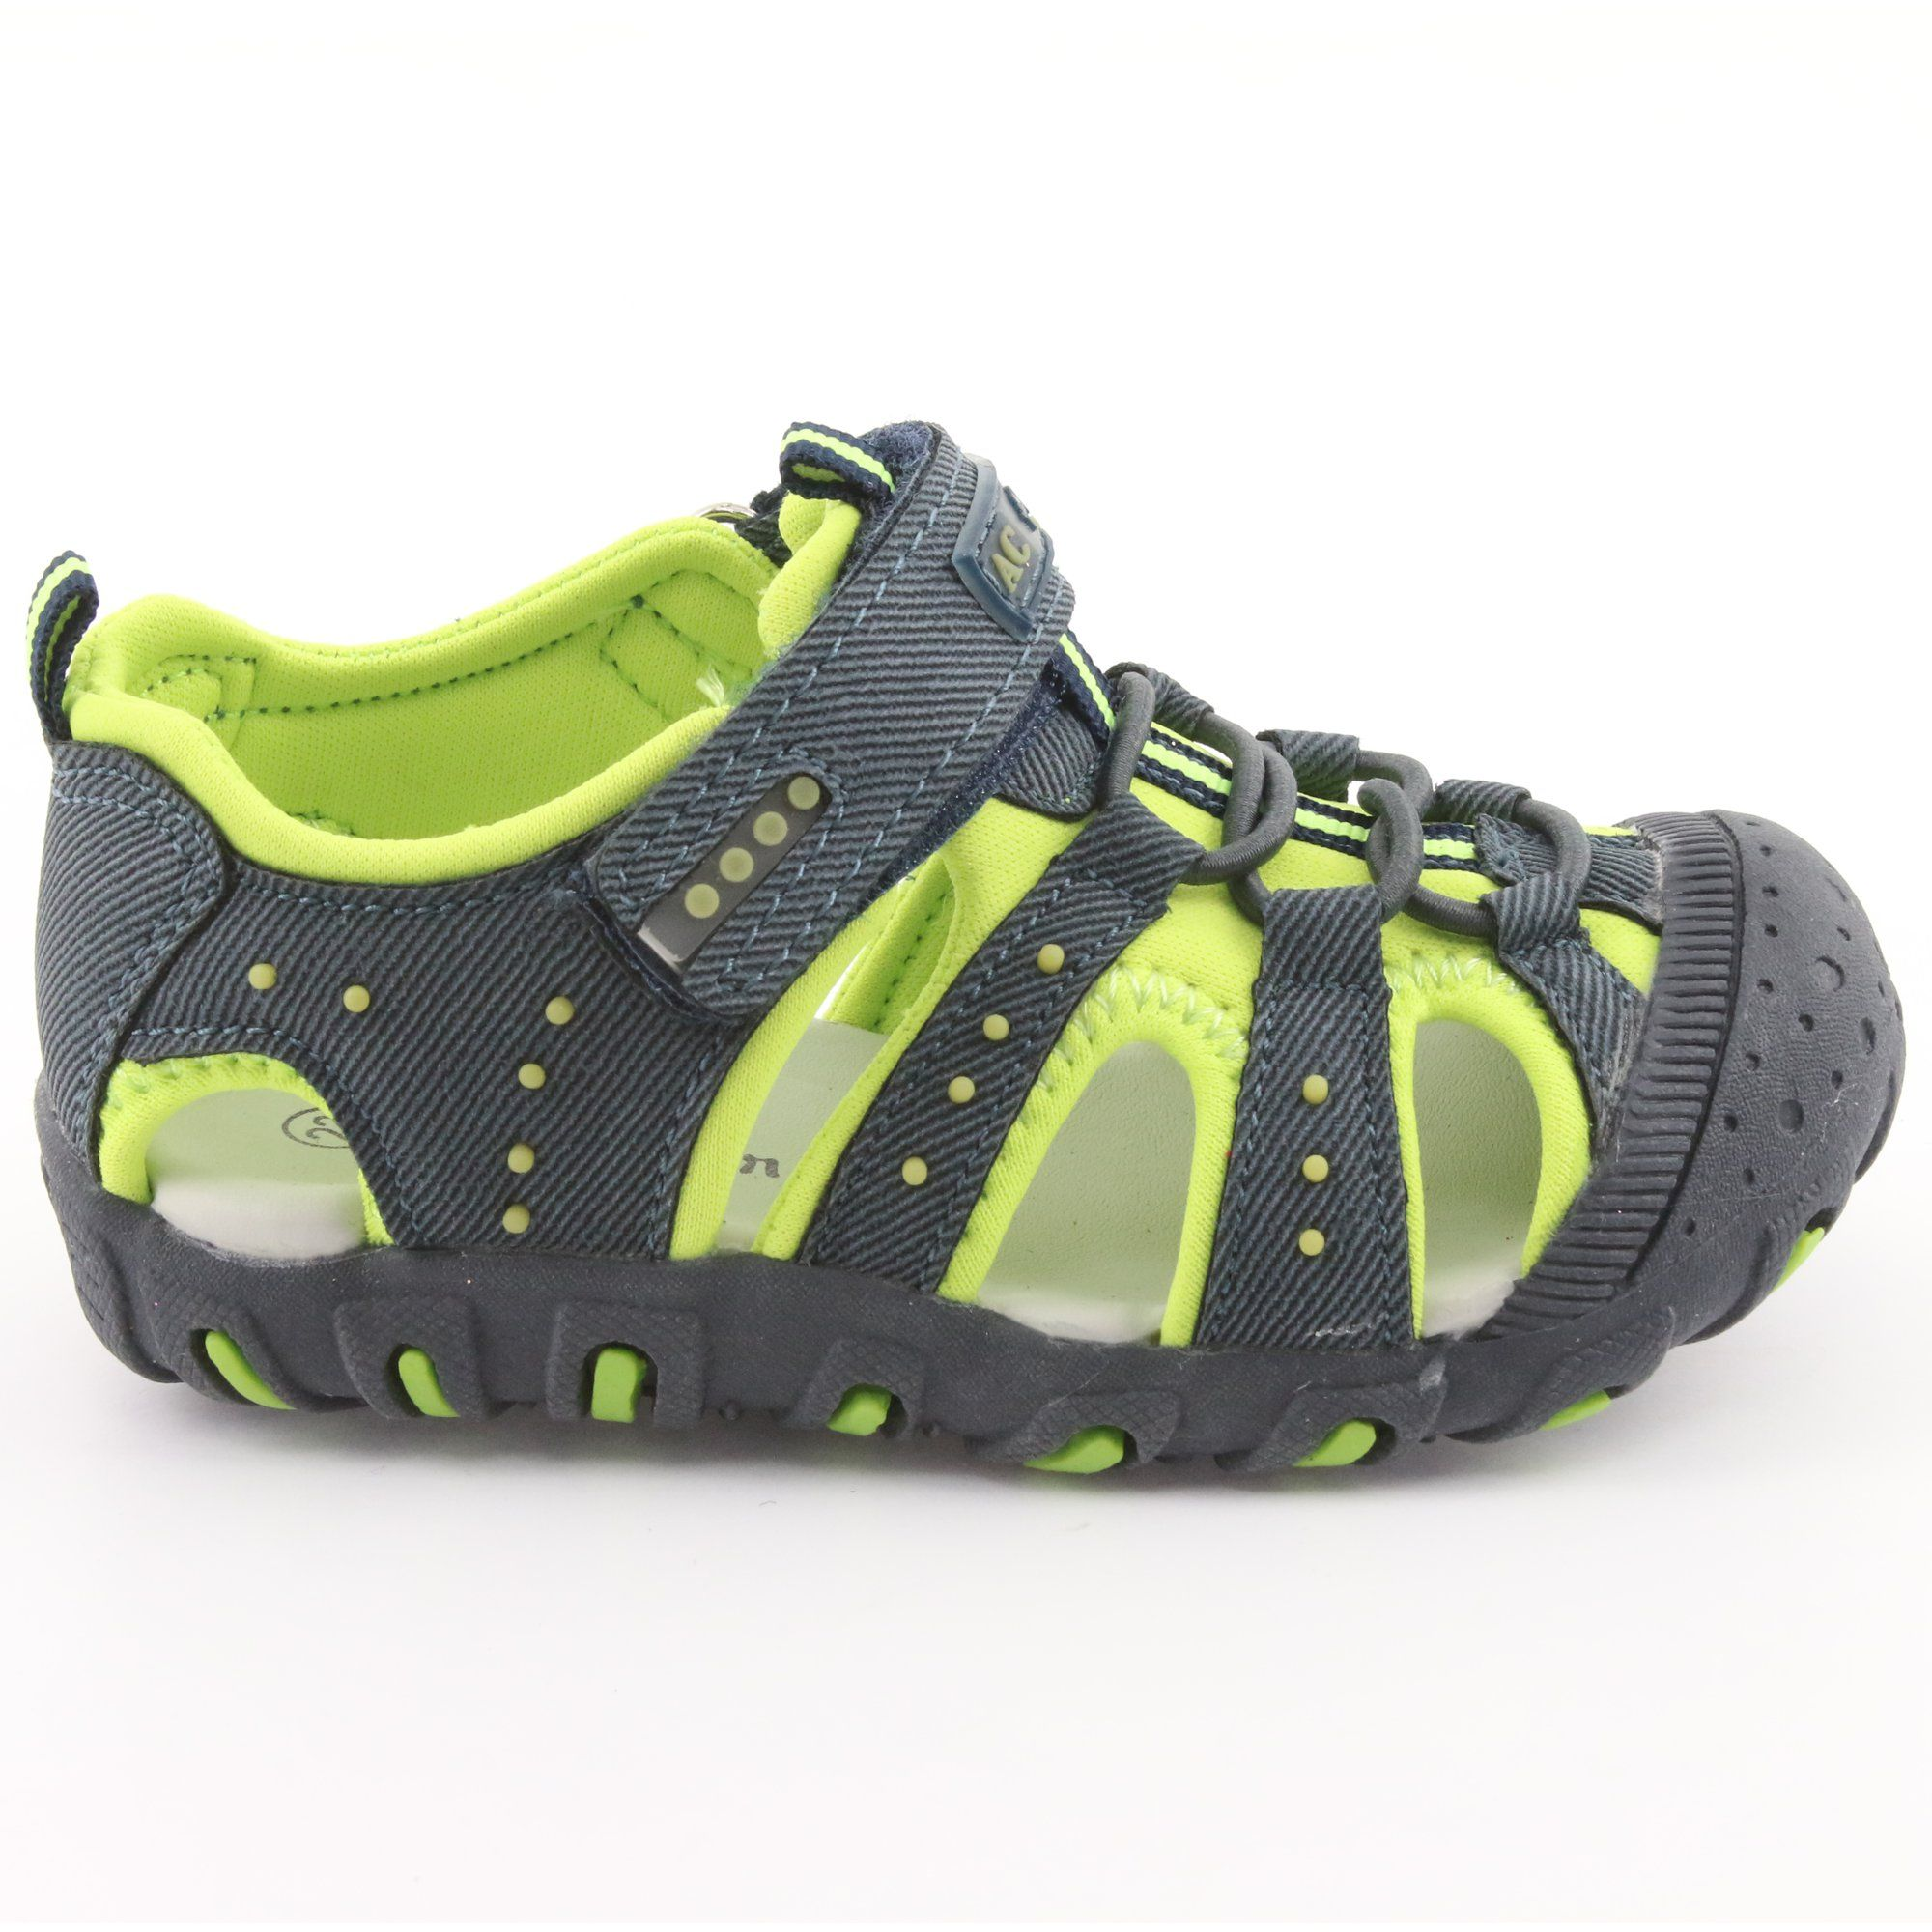 Sandalki Chlopiece Rzep American Club Dr11 Zielone Granatowe Childrens Shoes Kid Shoes Velcro